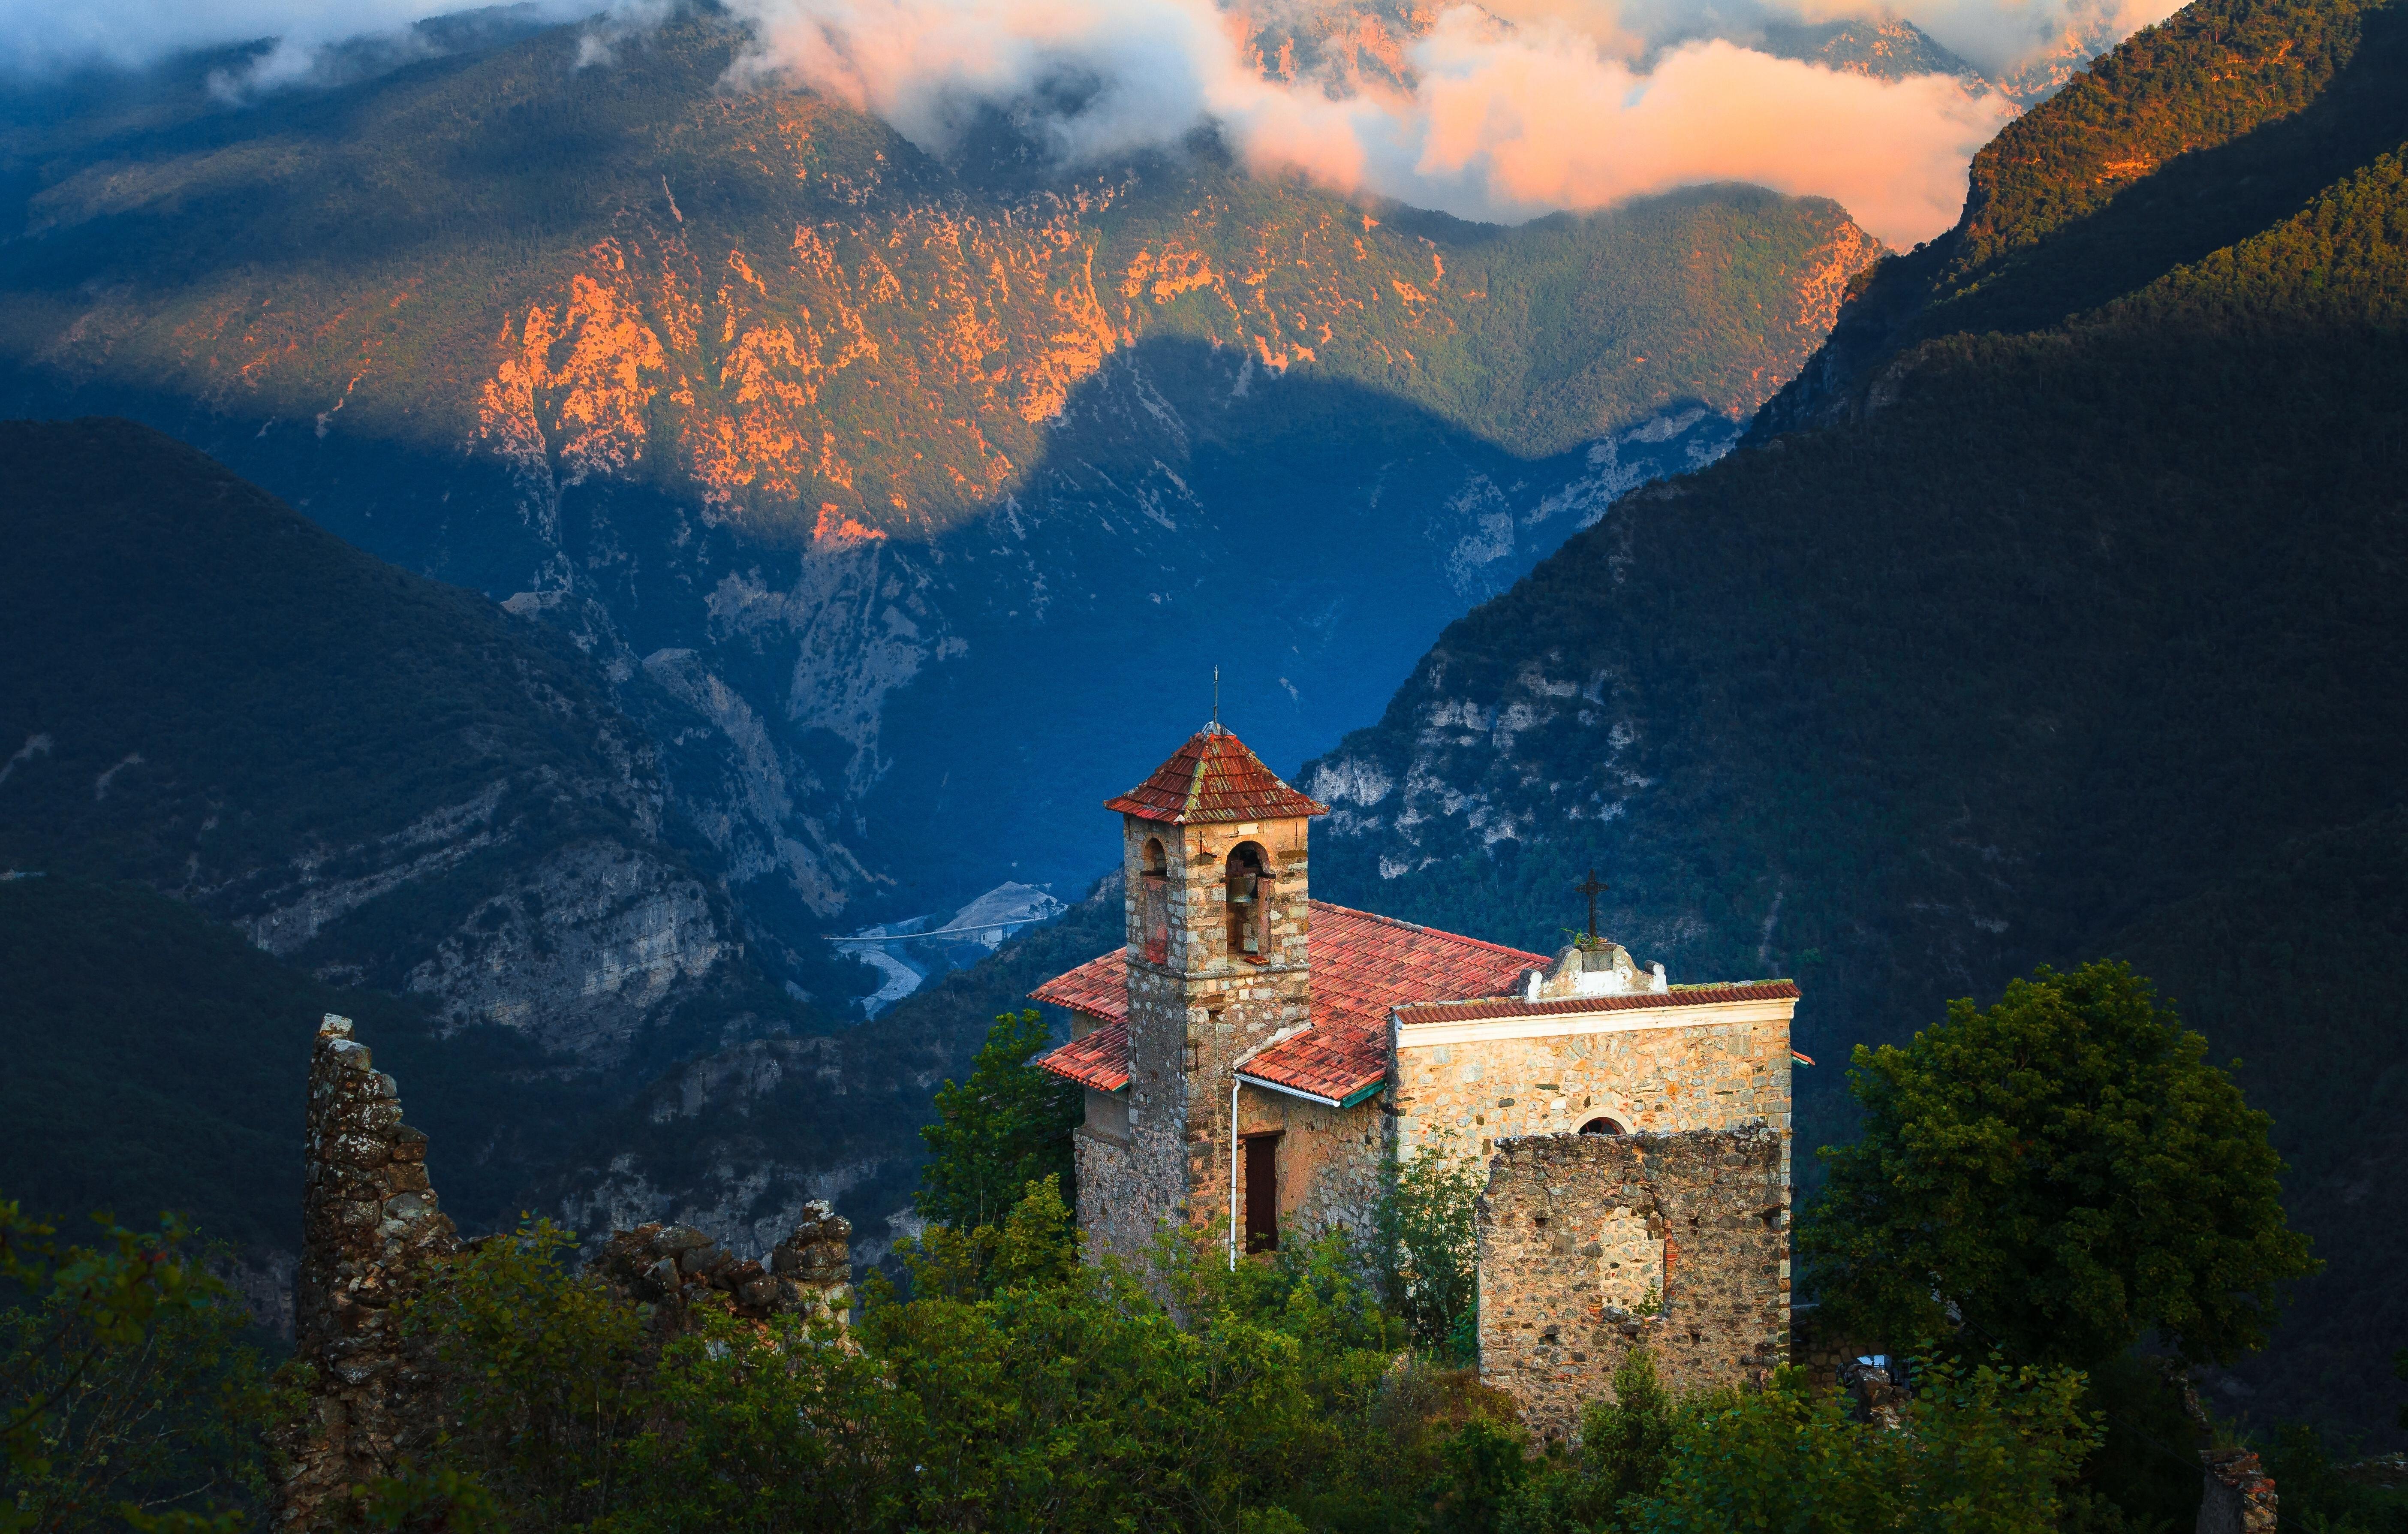 Wallpaper Nature Photo Picture Tornatore Alpes